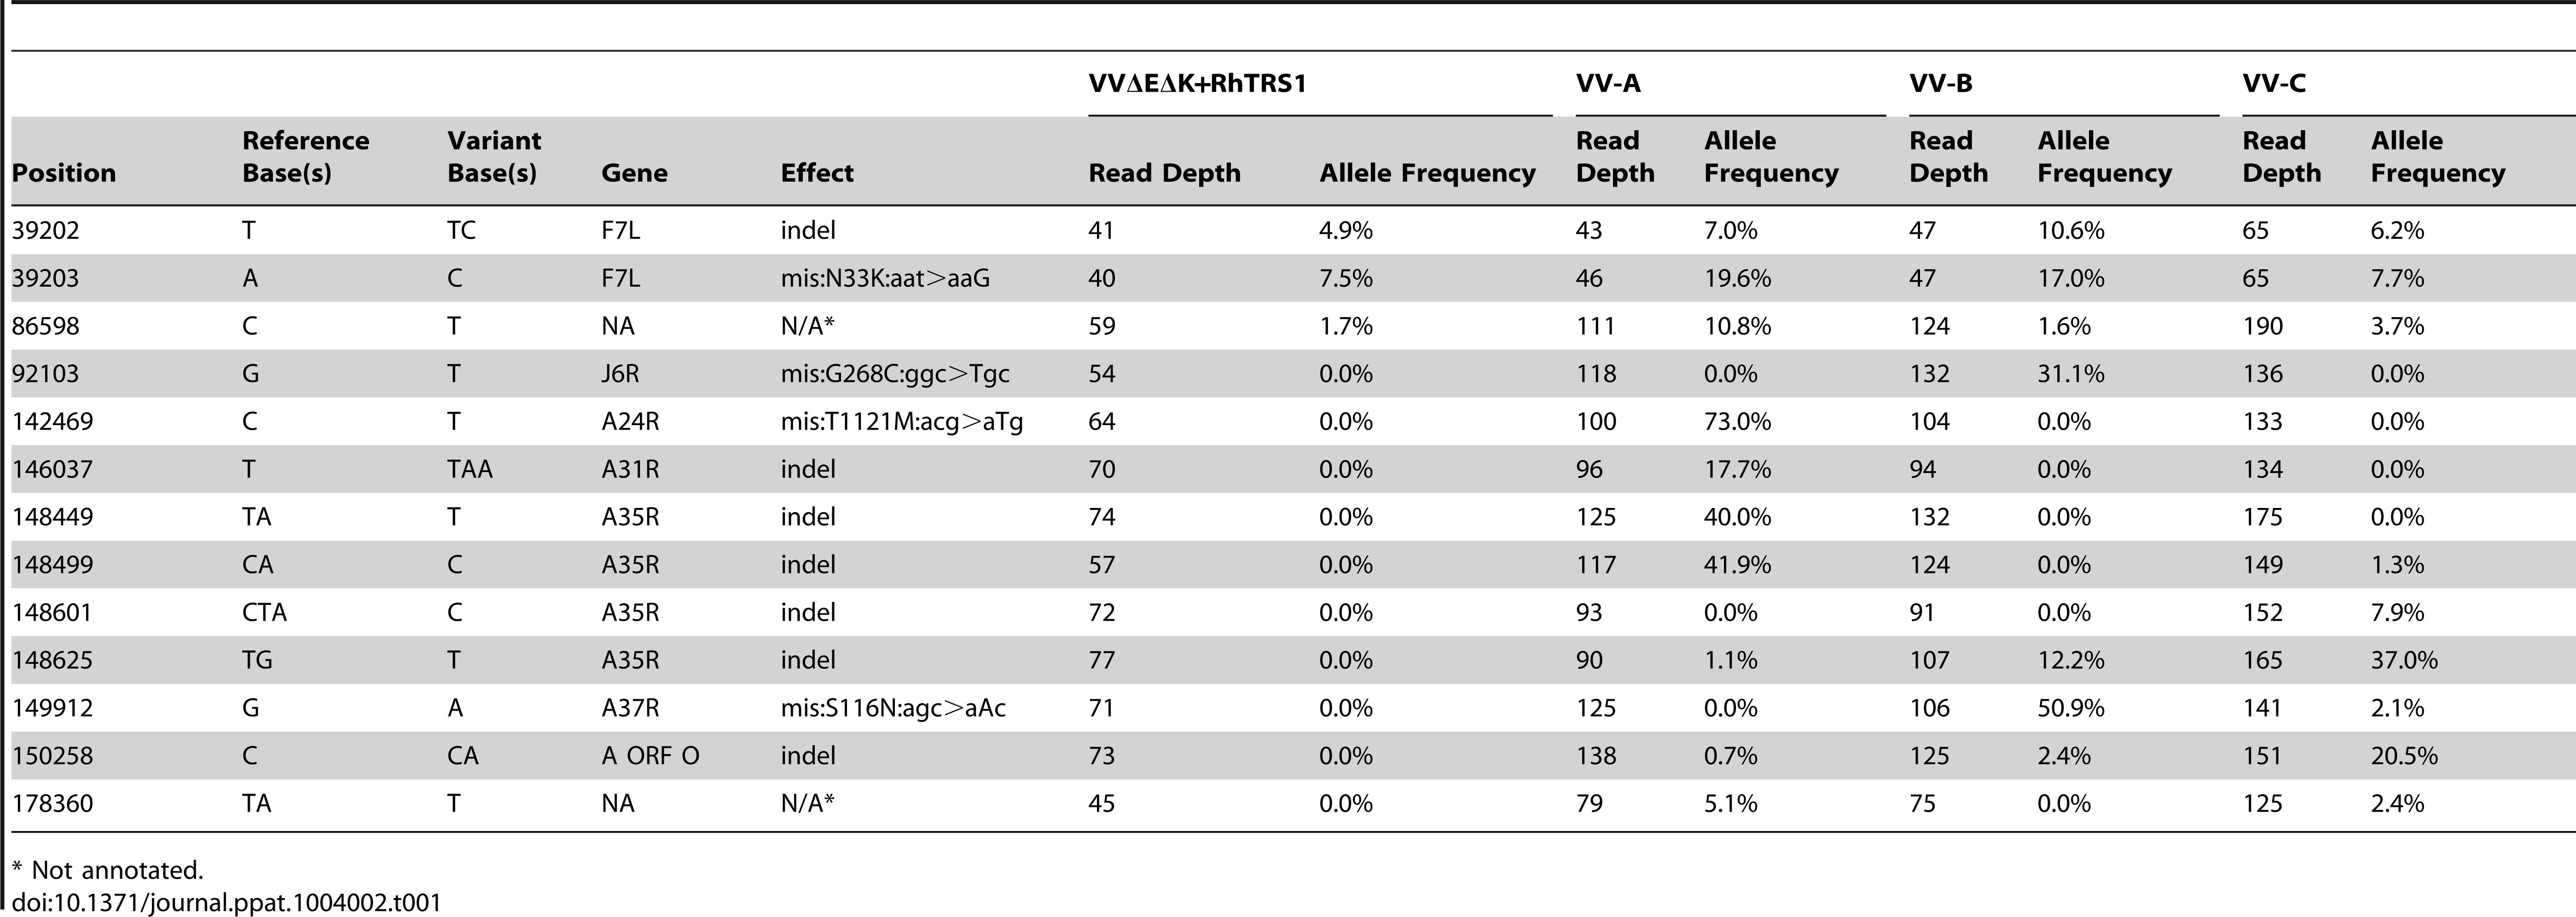 Mutations identified in VVΔEΔK+RhTRS1 and passaged viruses relative to vaccinia virus (strain Copenhagen).